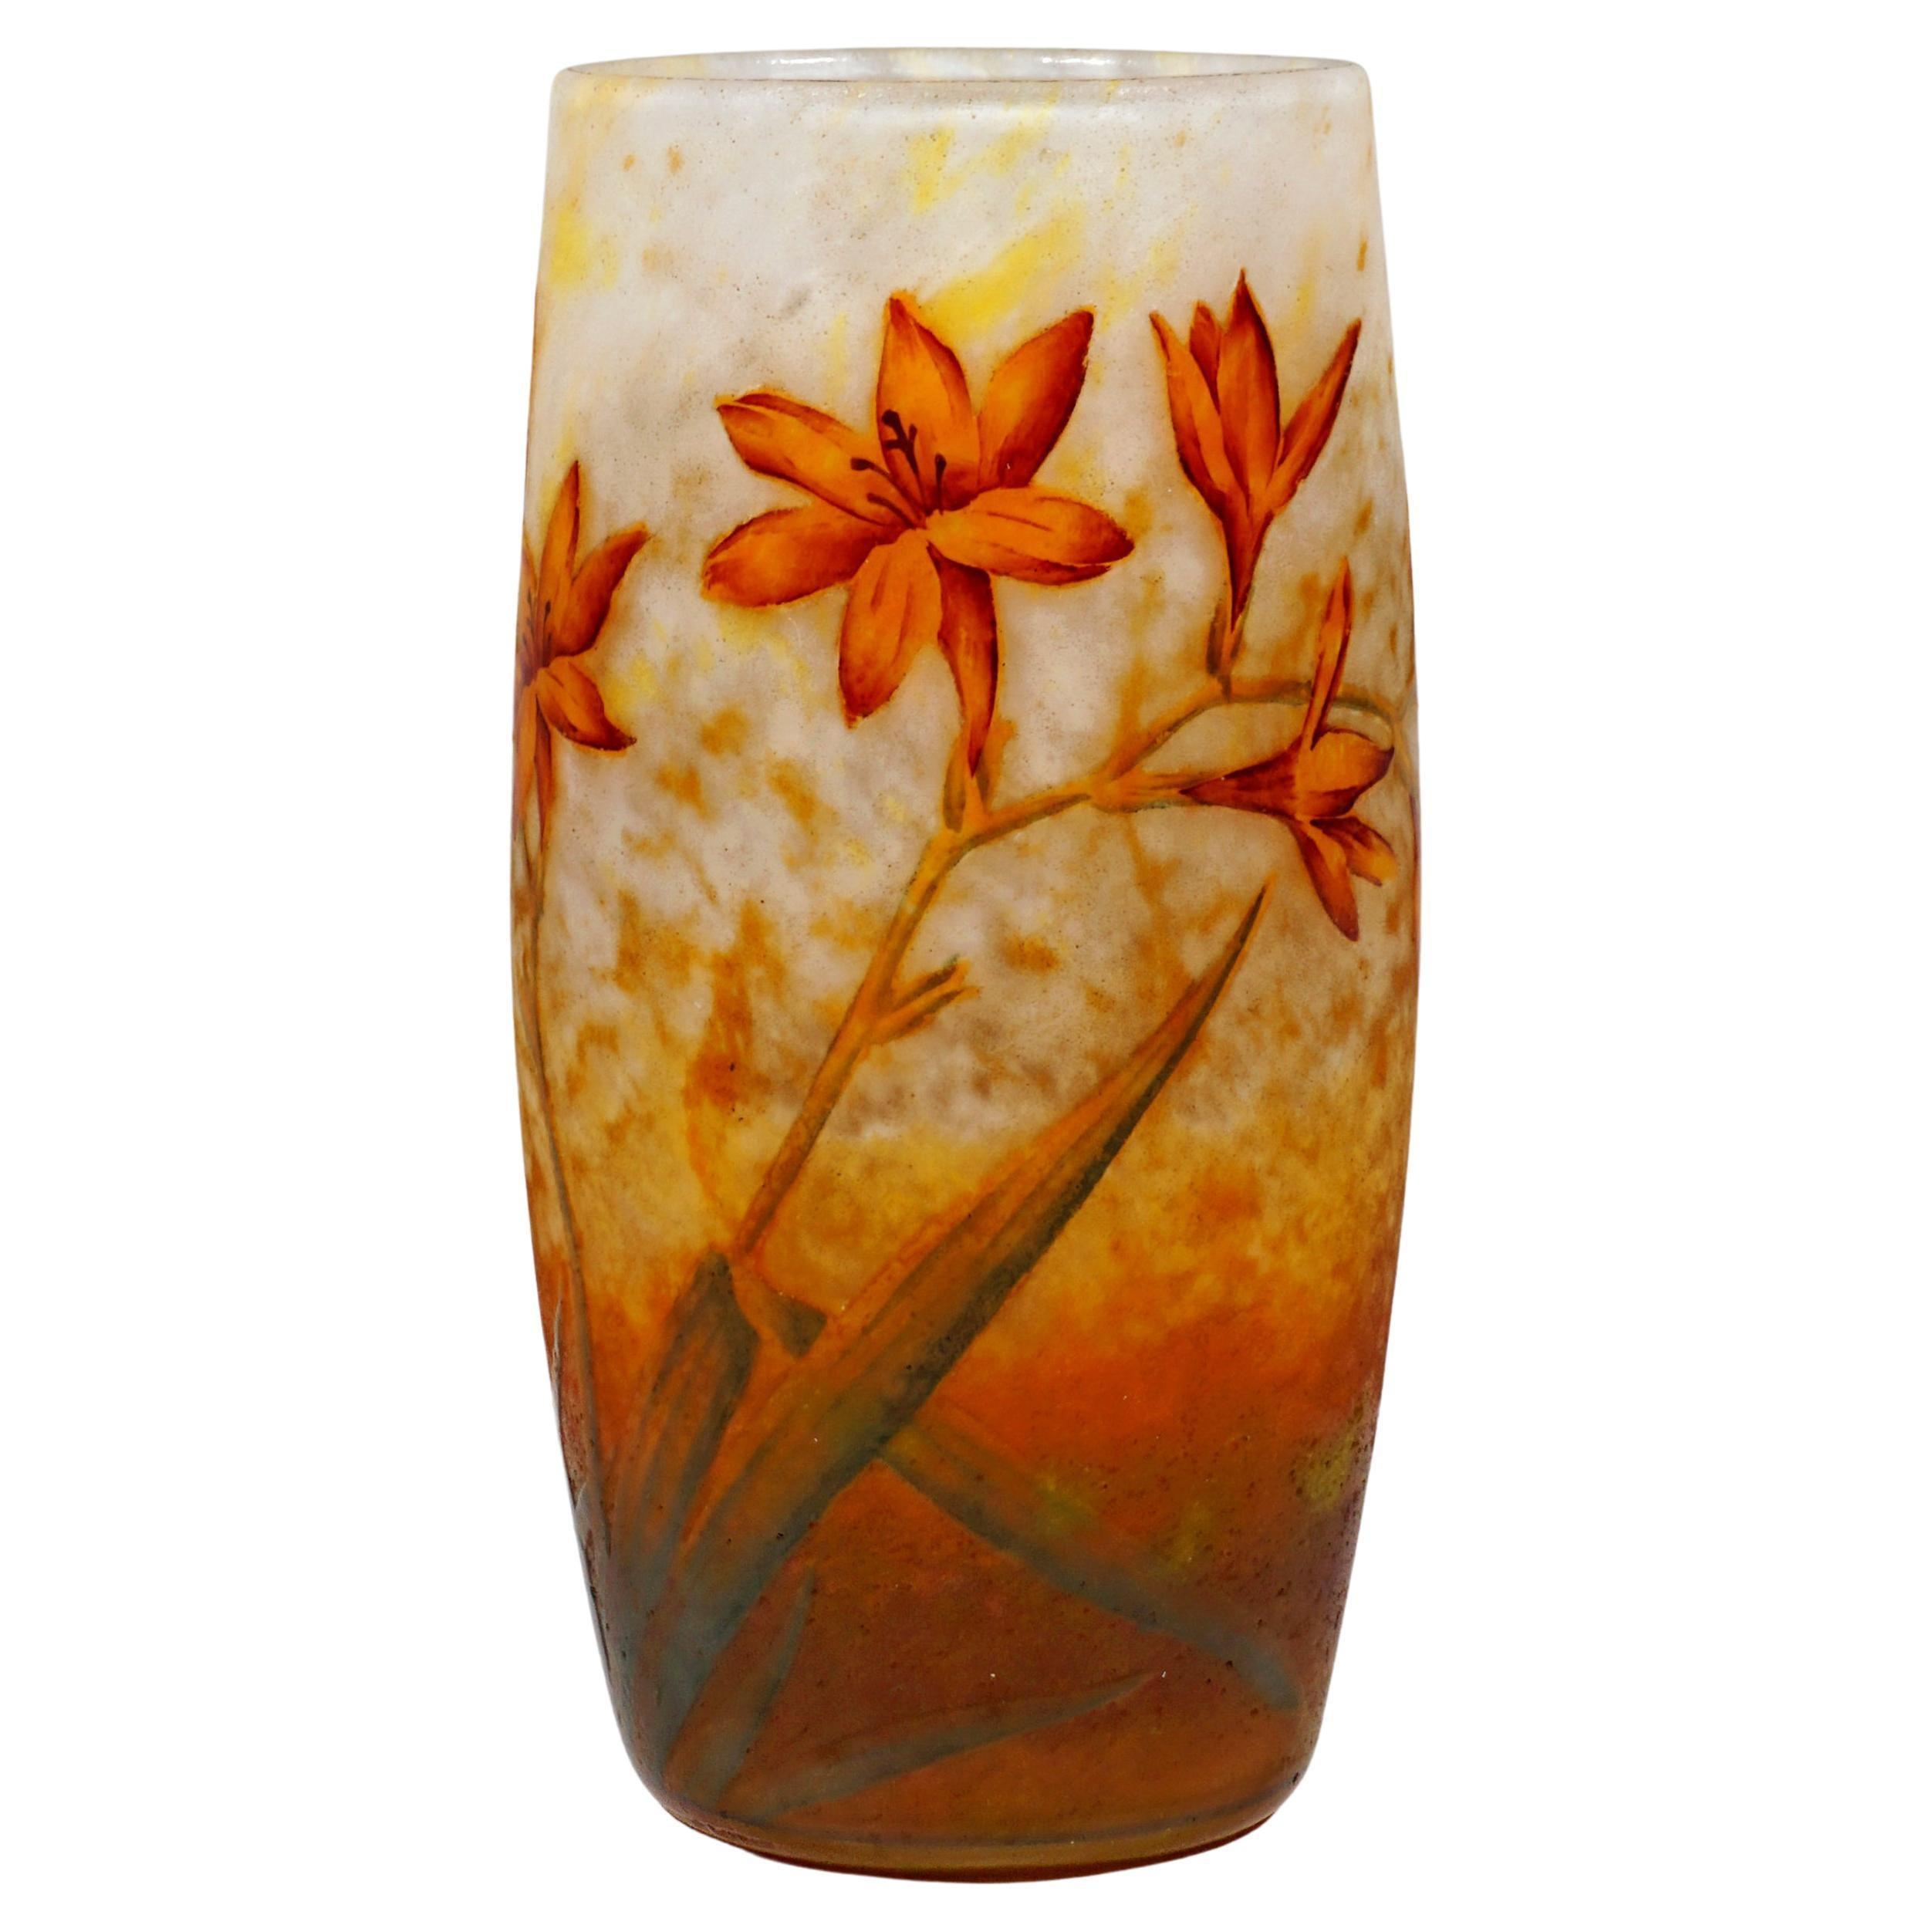 Art Nouveau Cameo Vase with Daylily Decor, Daum Nancy, France, 1900/05